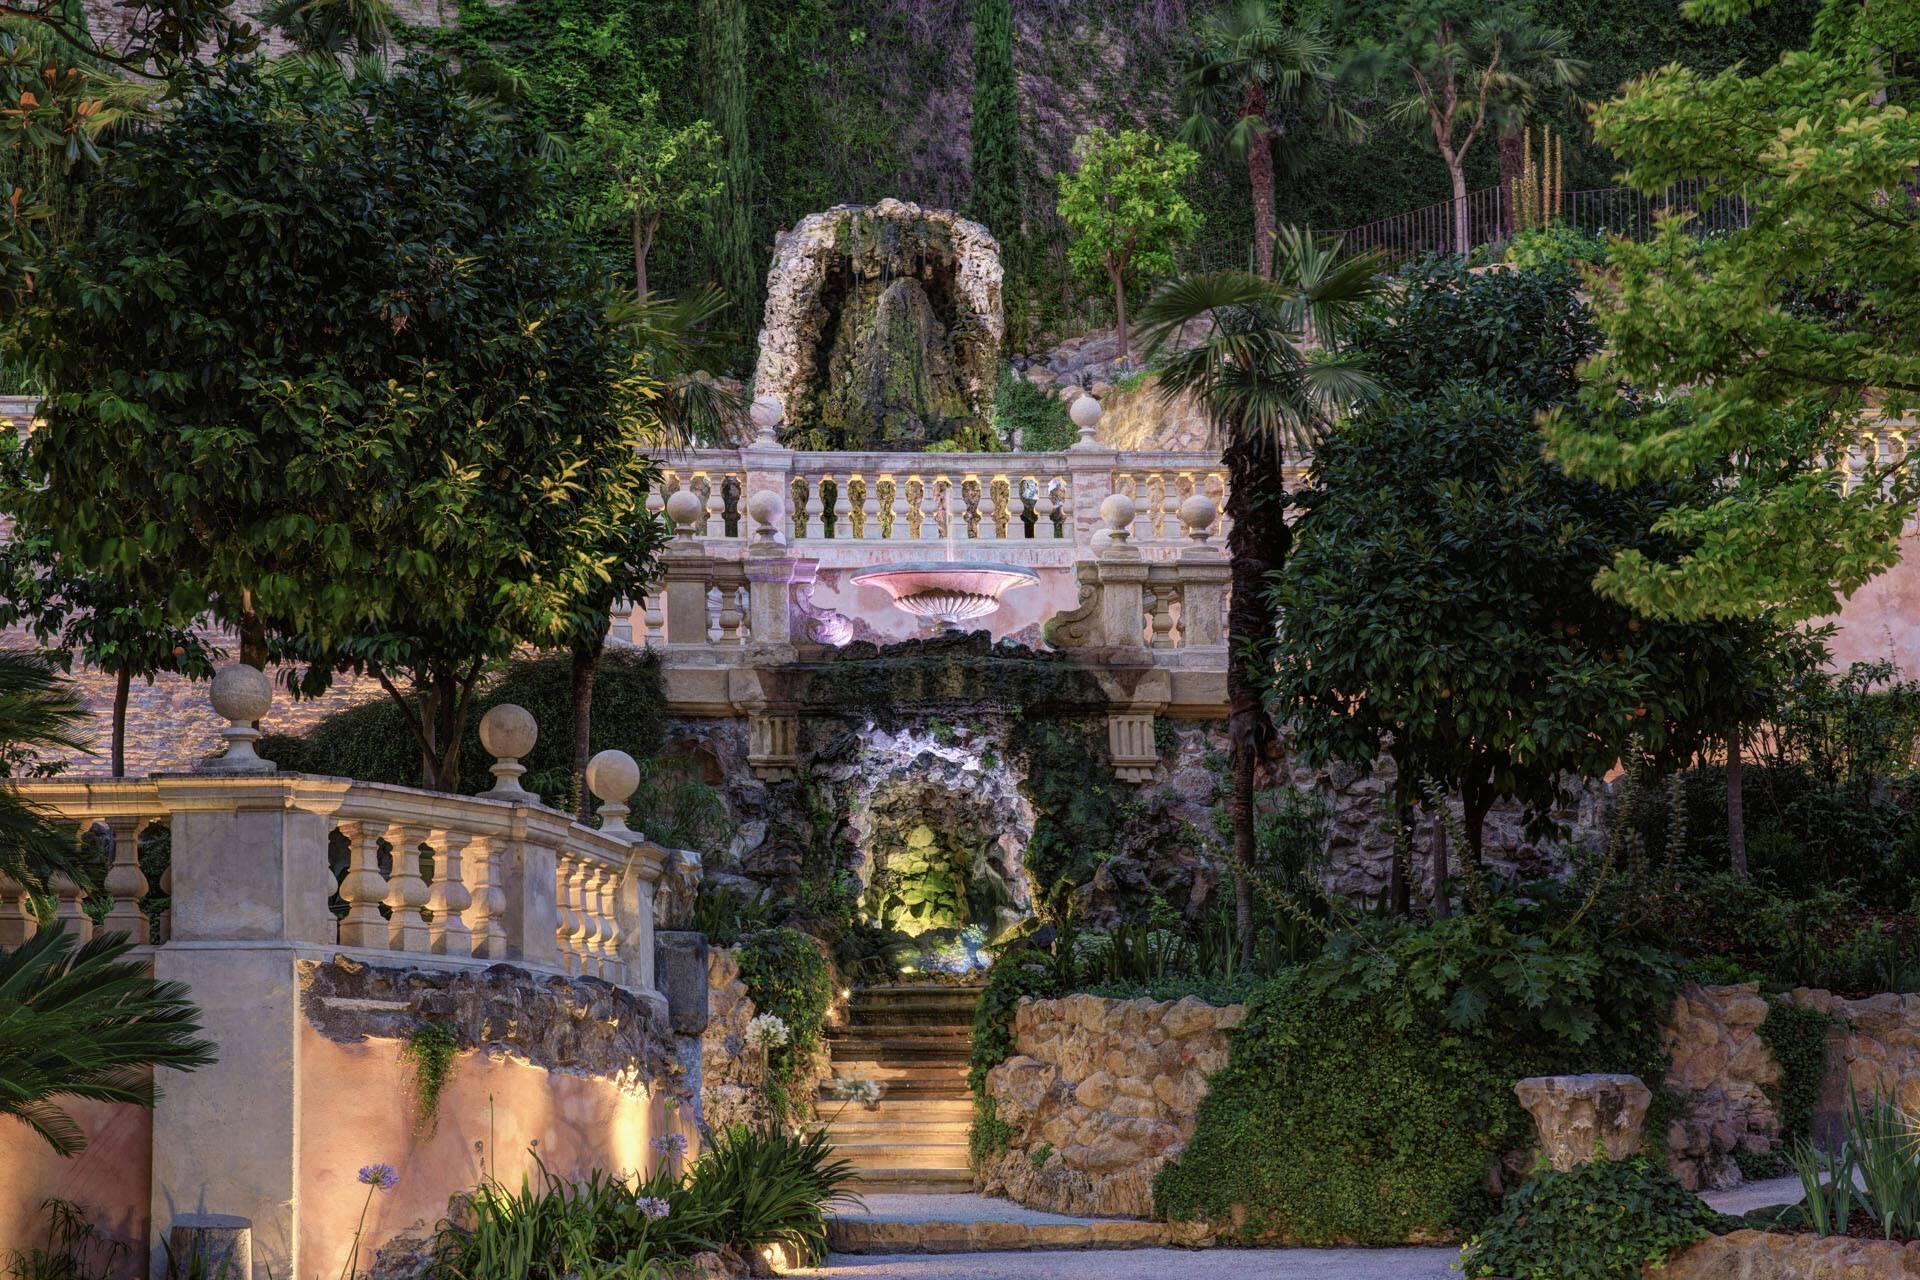 Hotel de Russie Rome Secret Garden